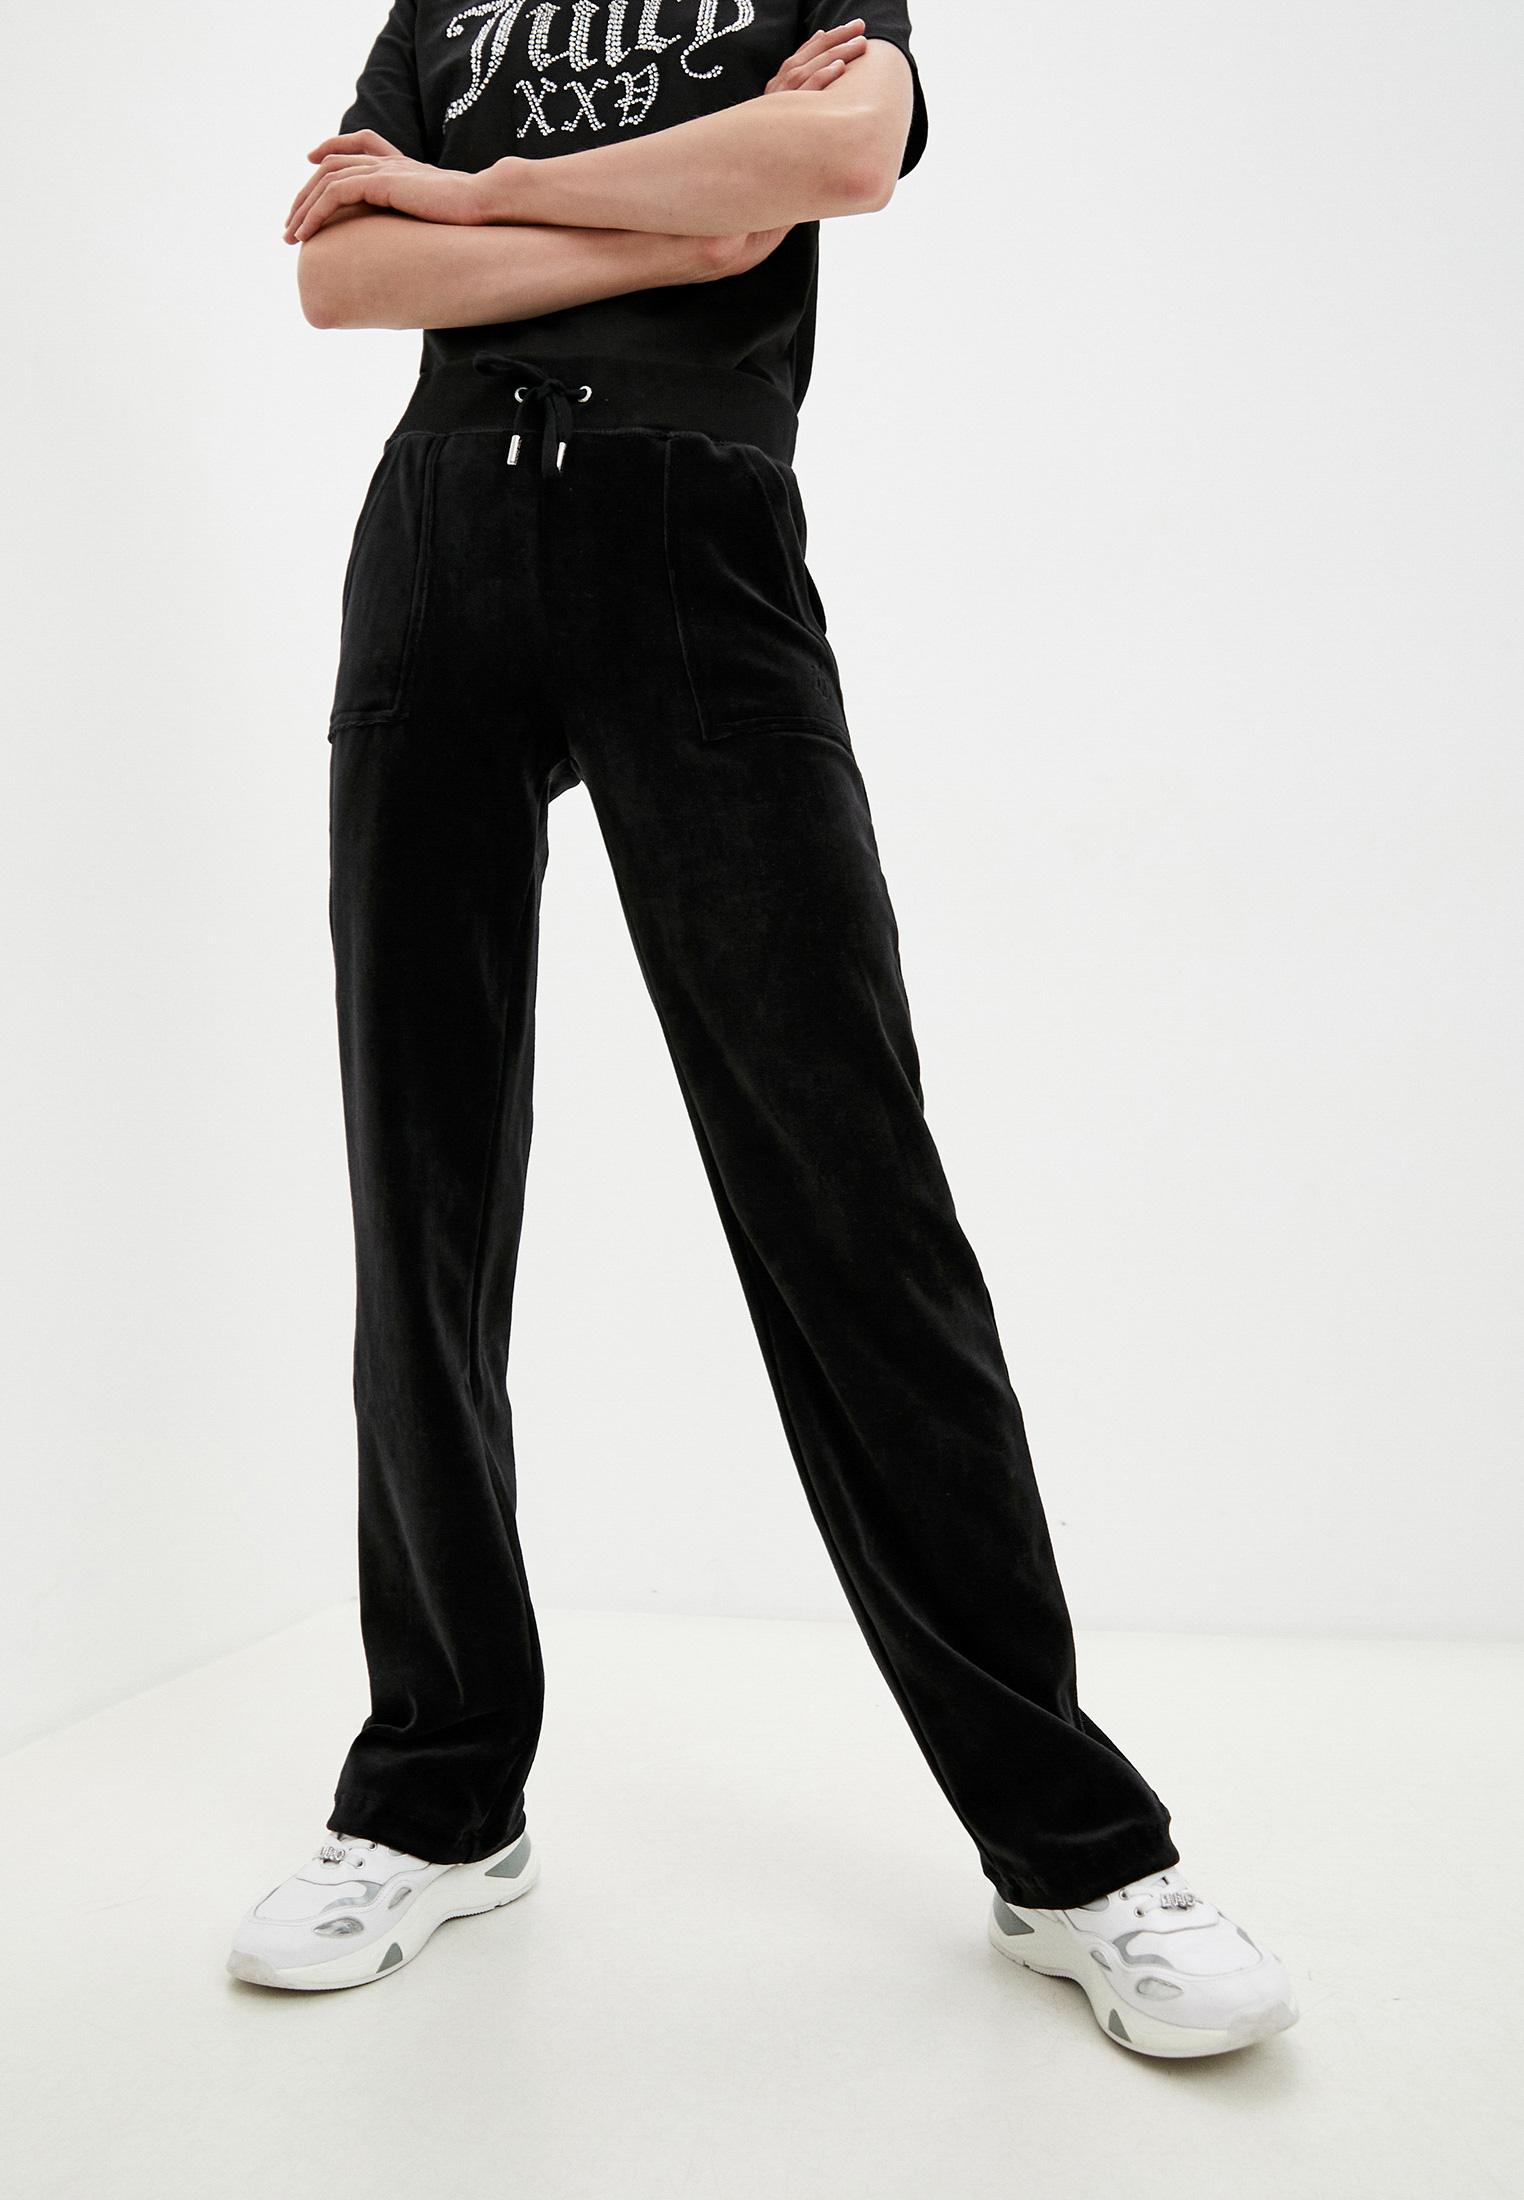 Женские спортивные брюки Juicy Couture (Джуси Кутюр) JCCB221003